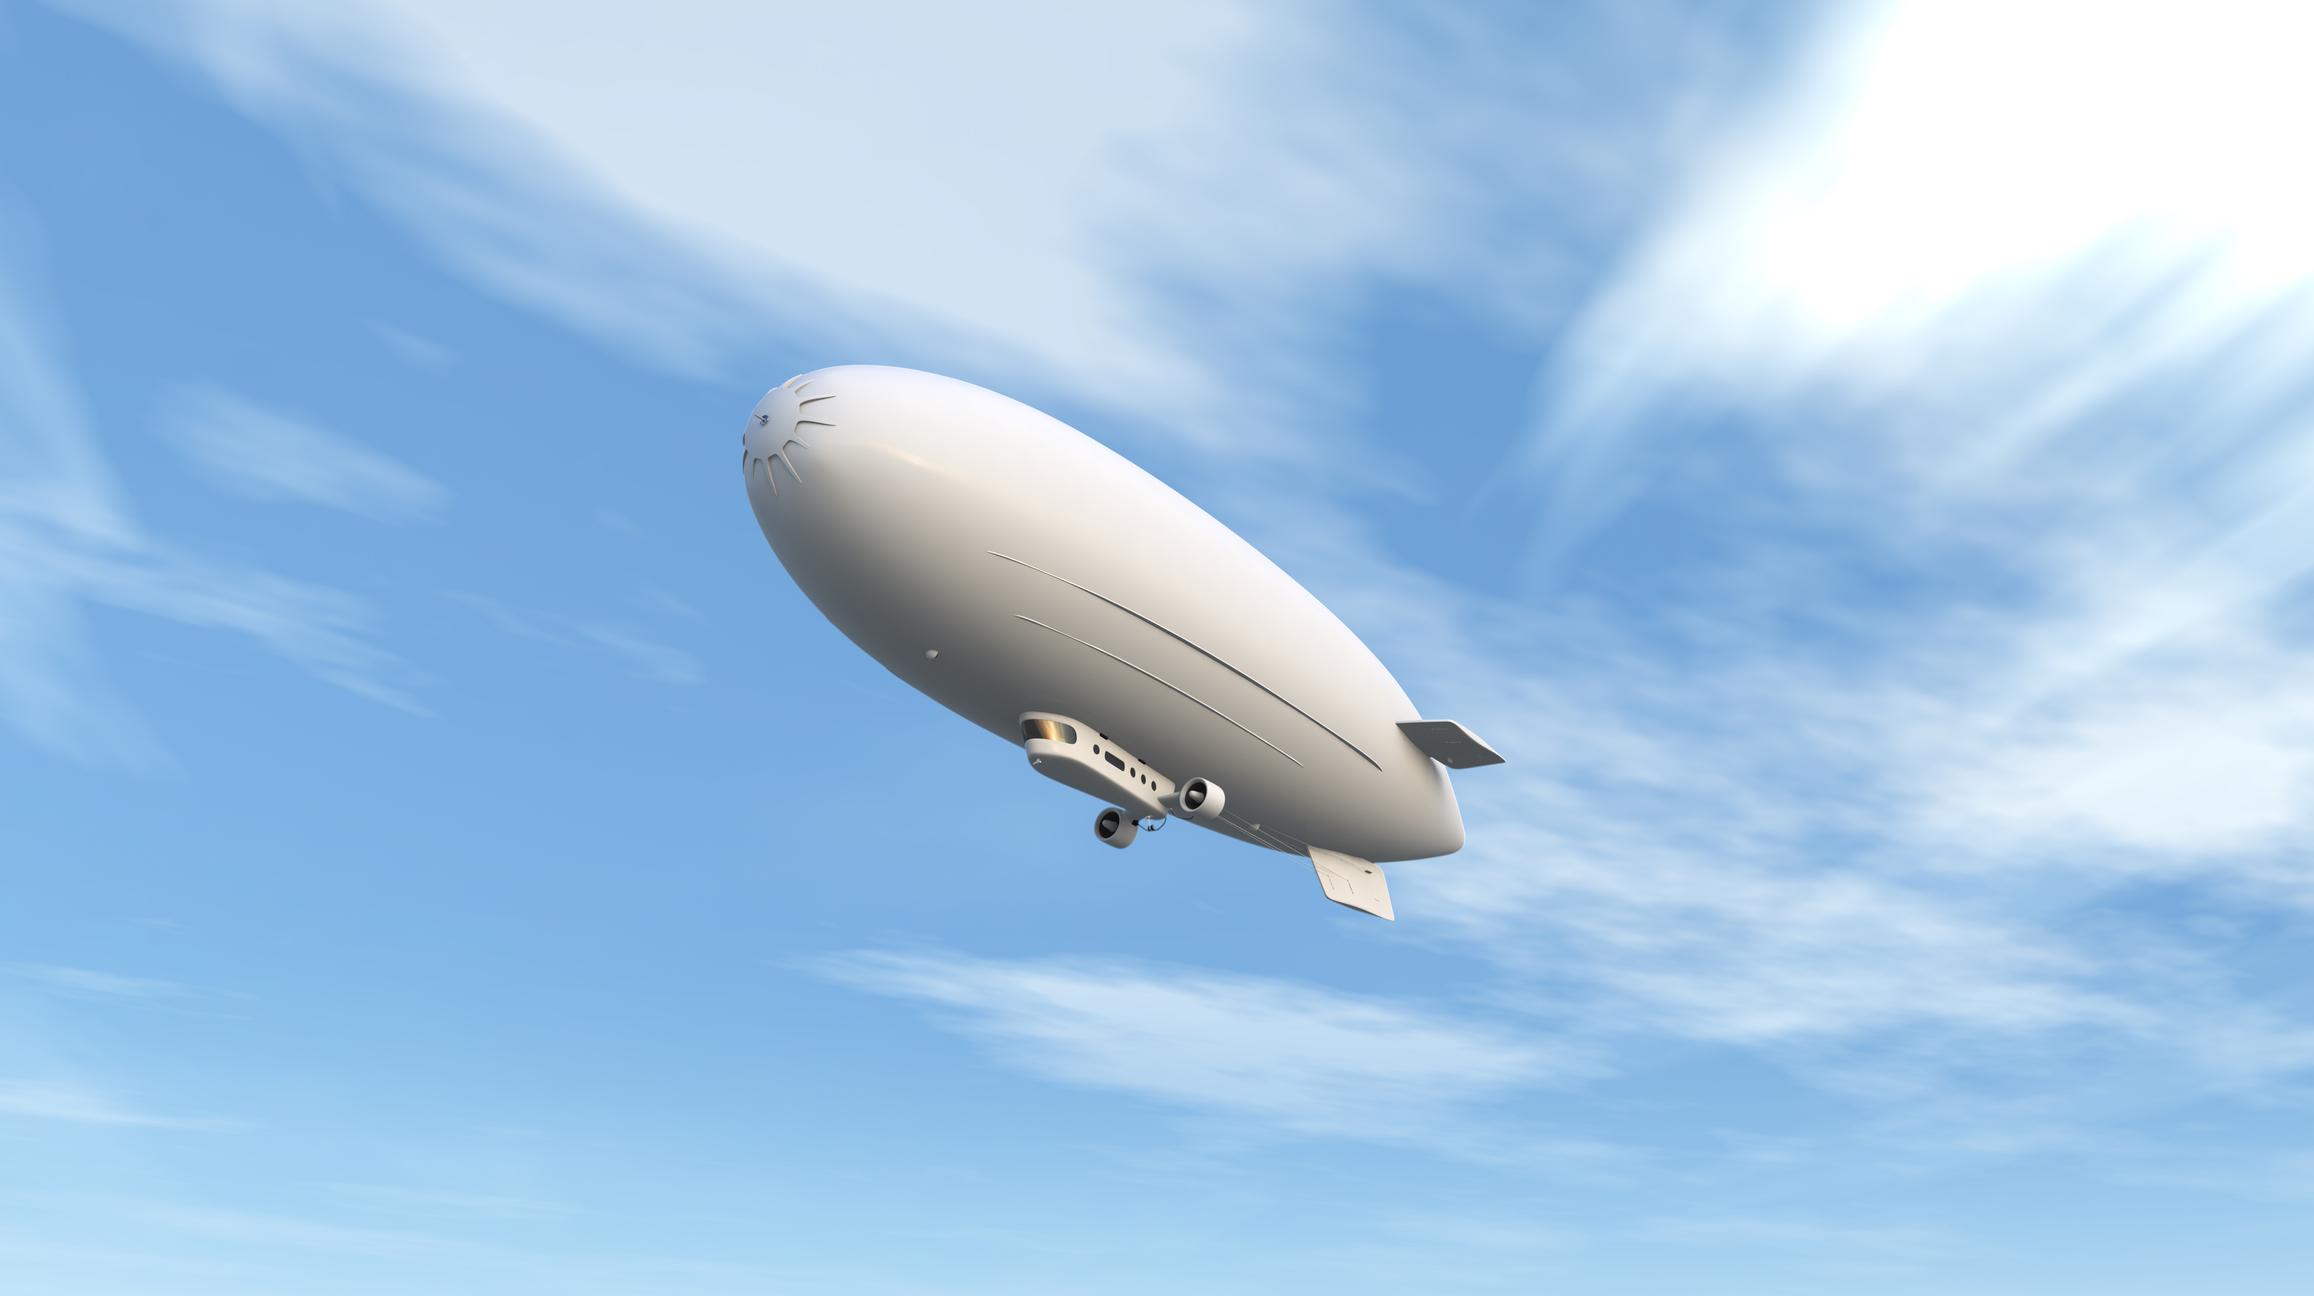 Airship, Blimp, Dirigibles